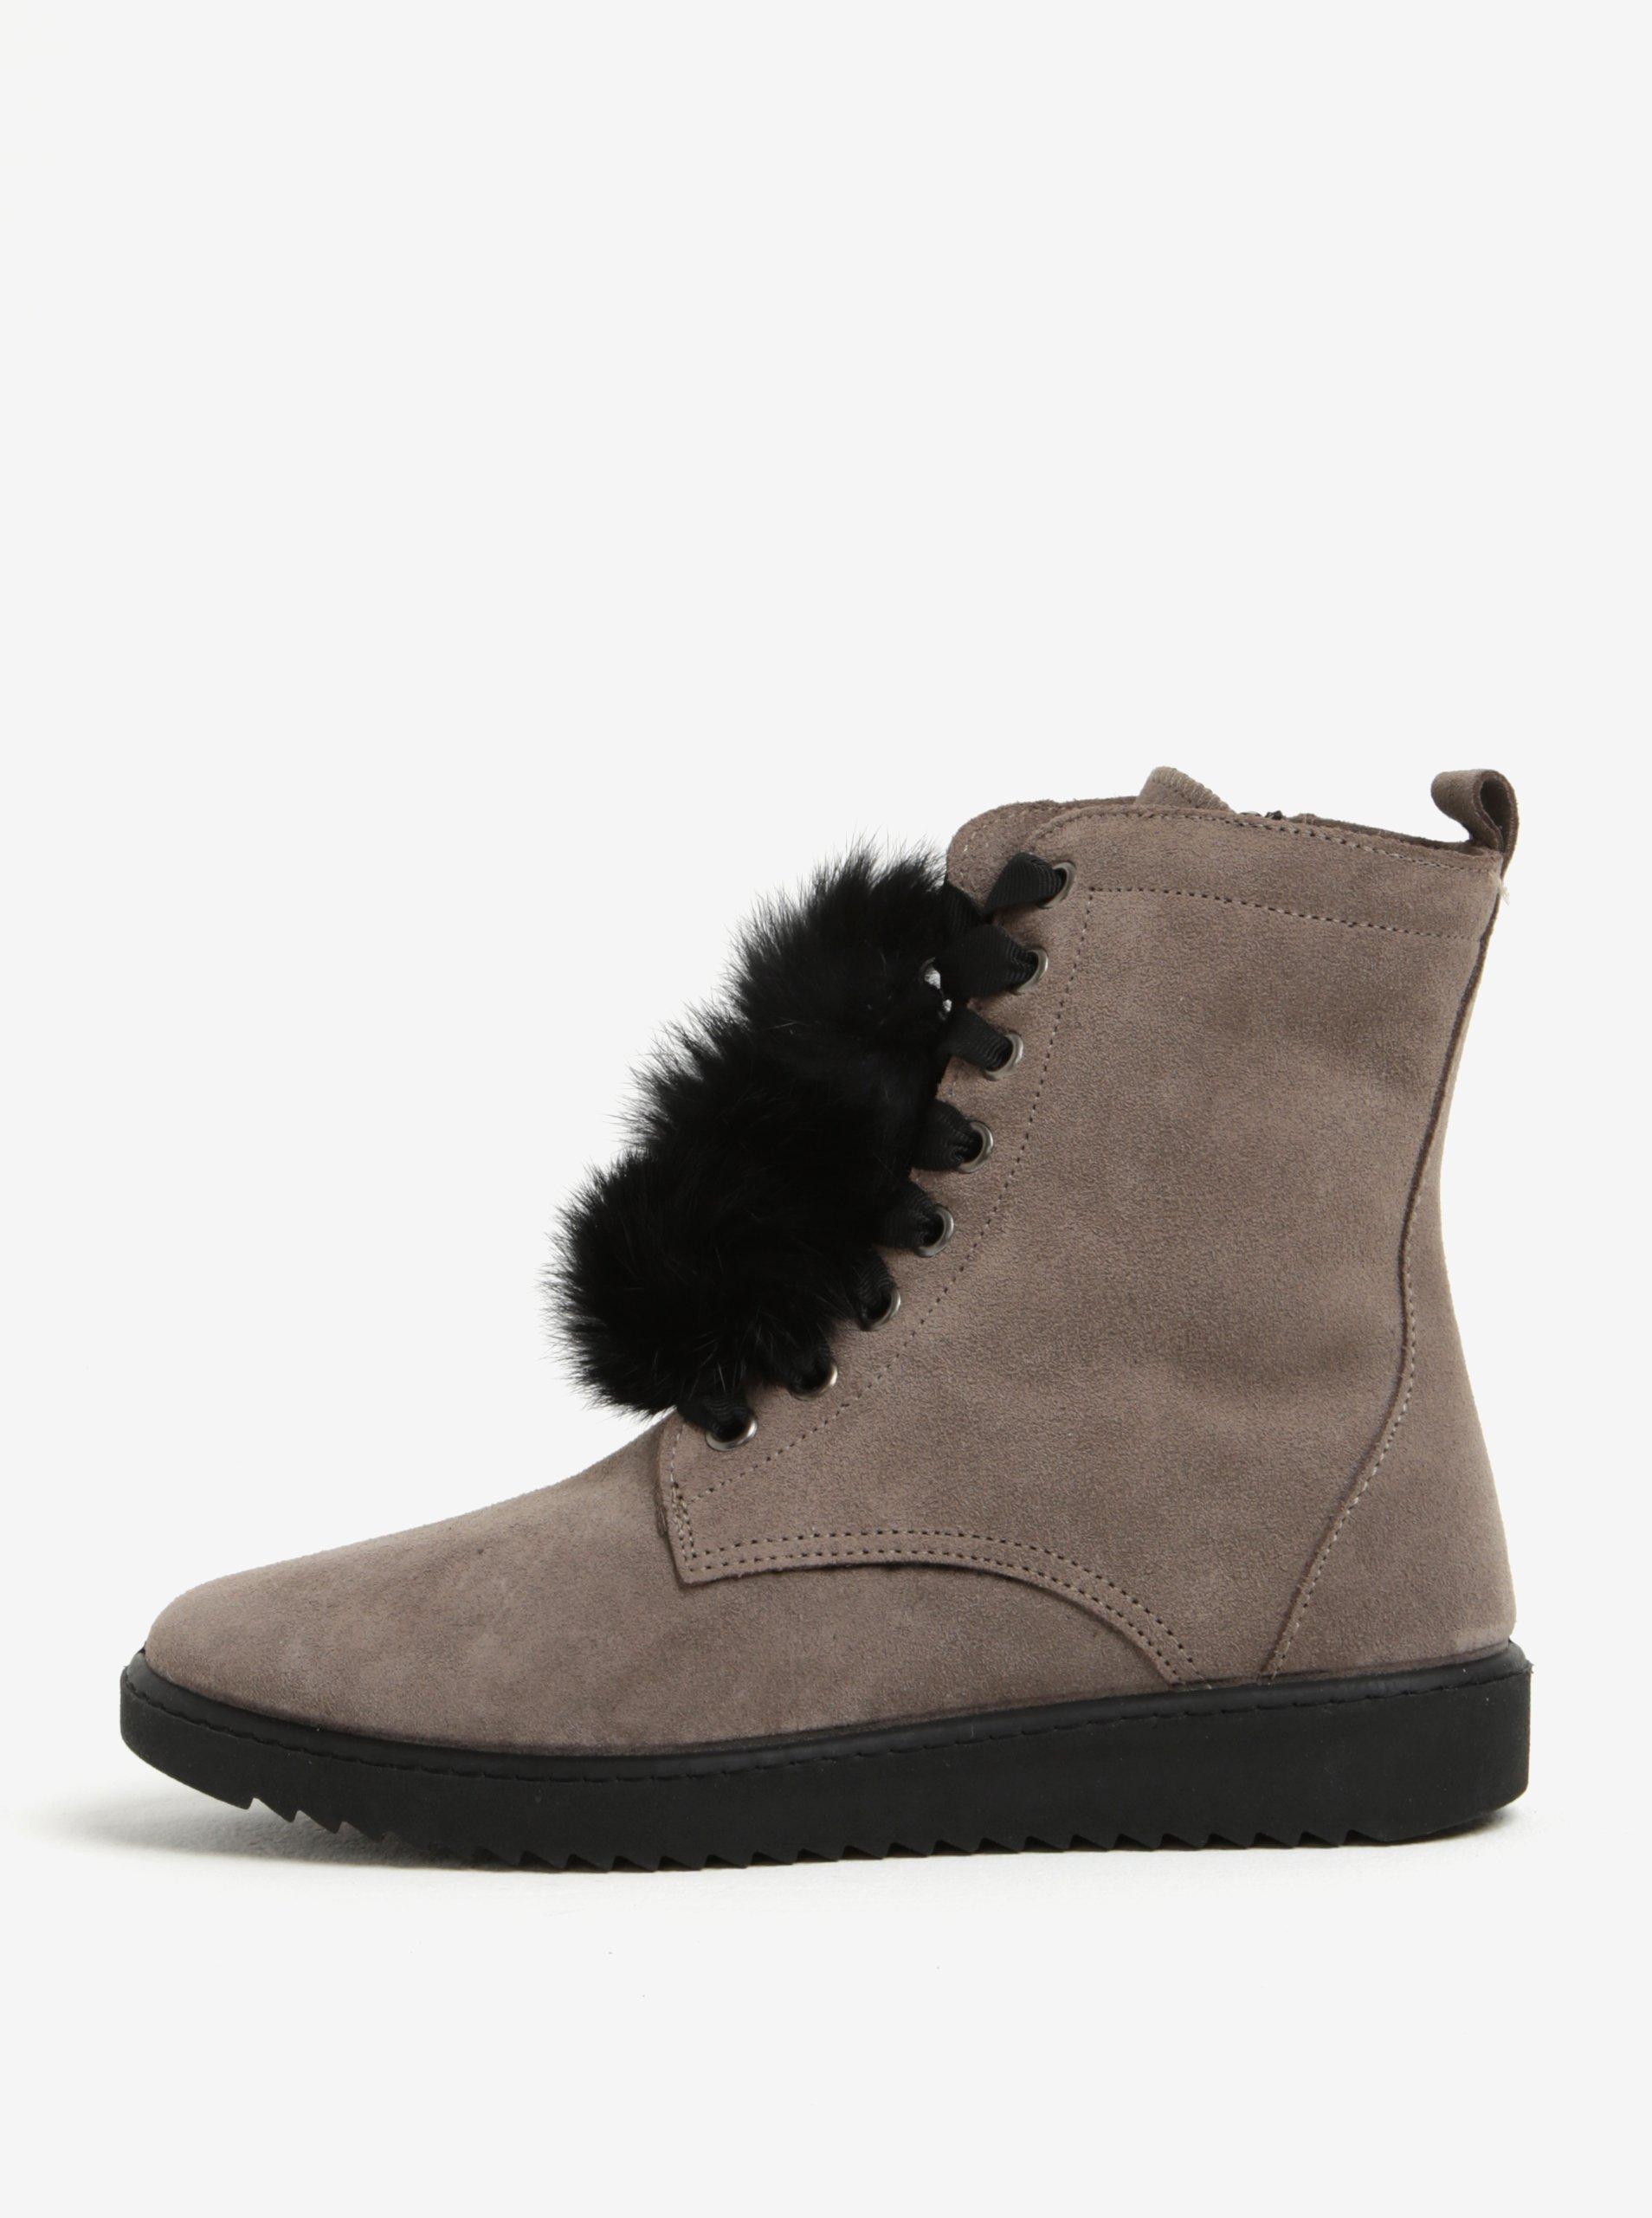 ecbff0e959 Sivé semišové členkové topánky s brmbolcami OJJU